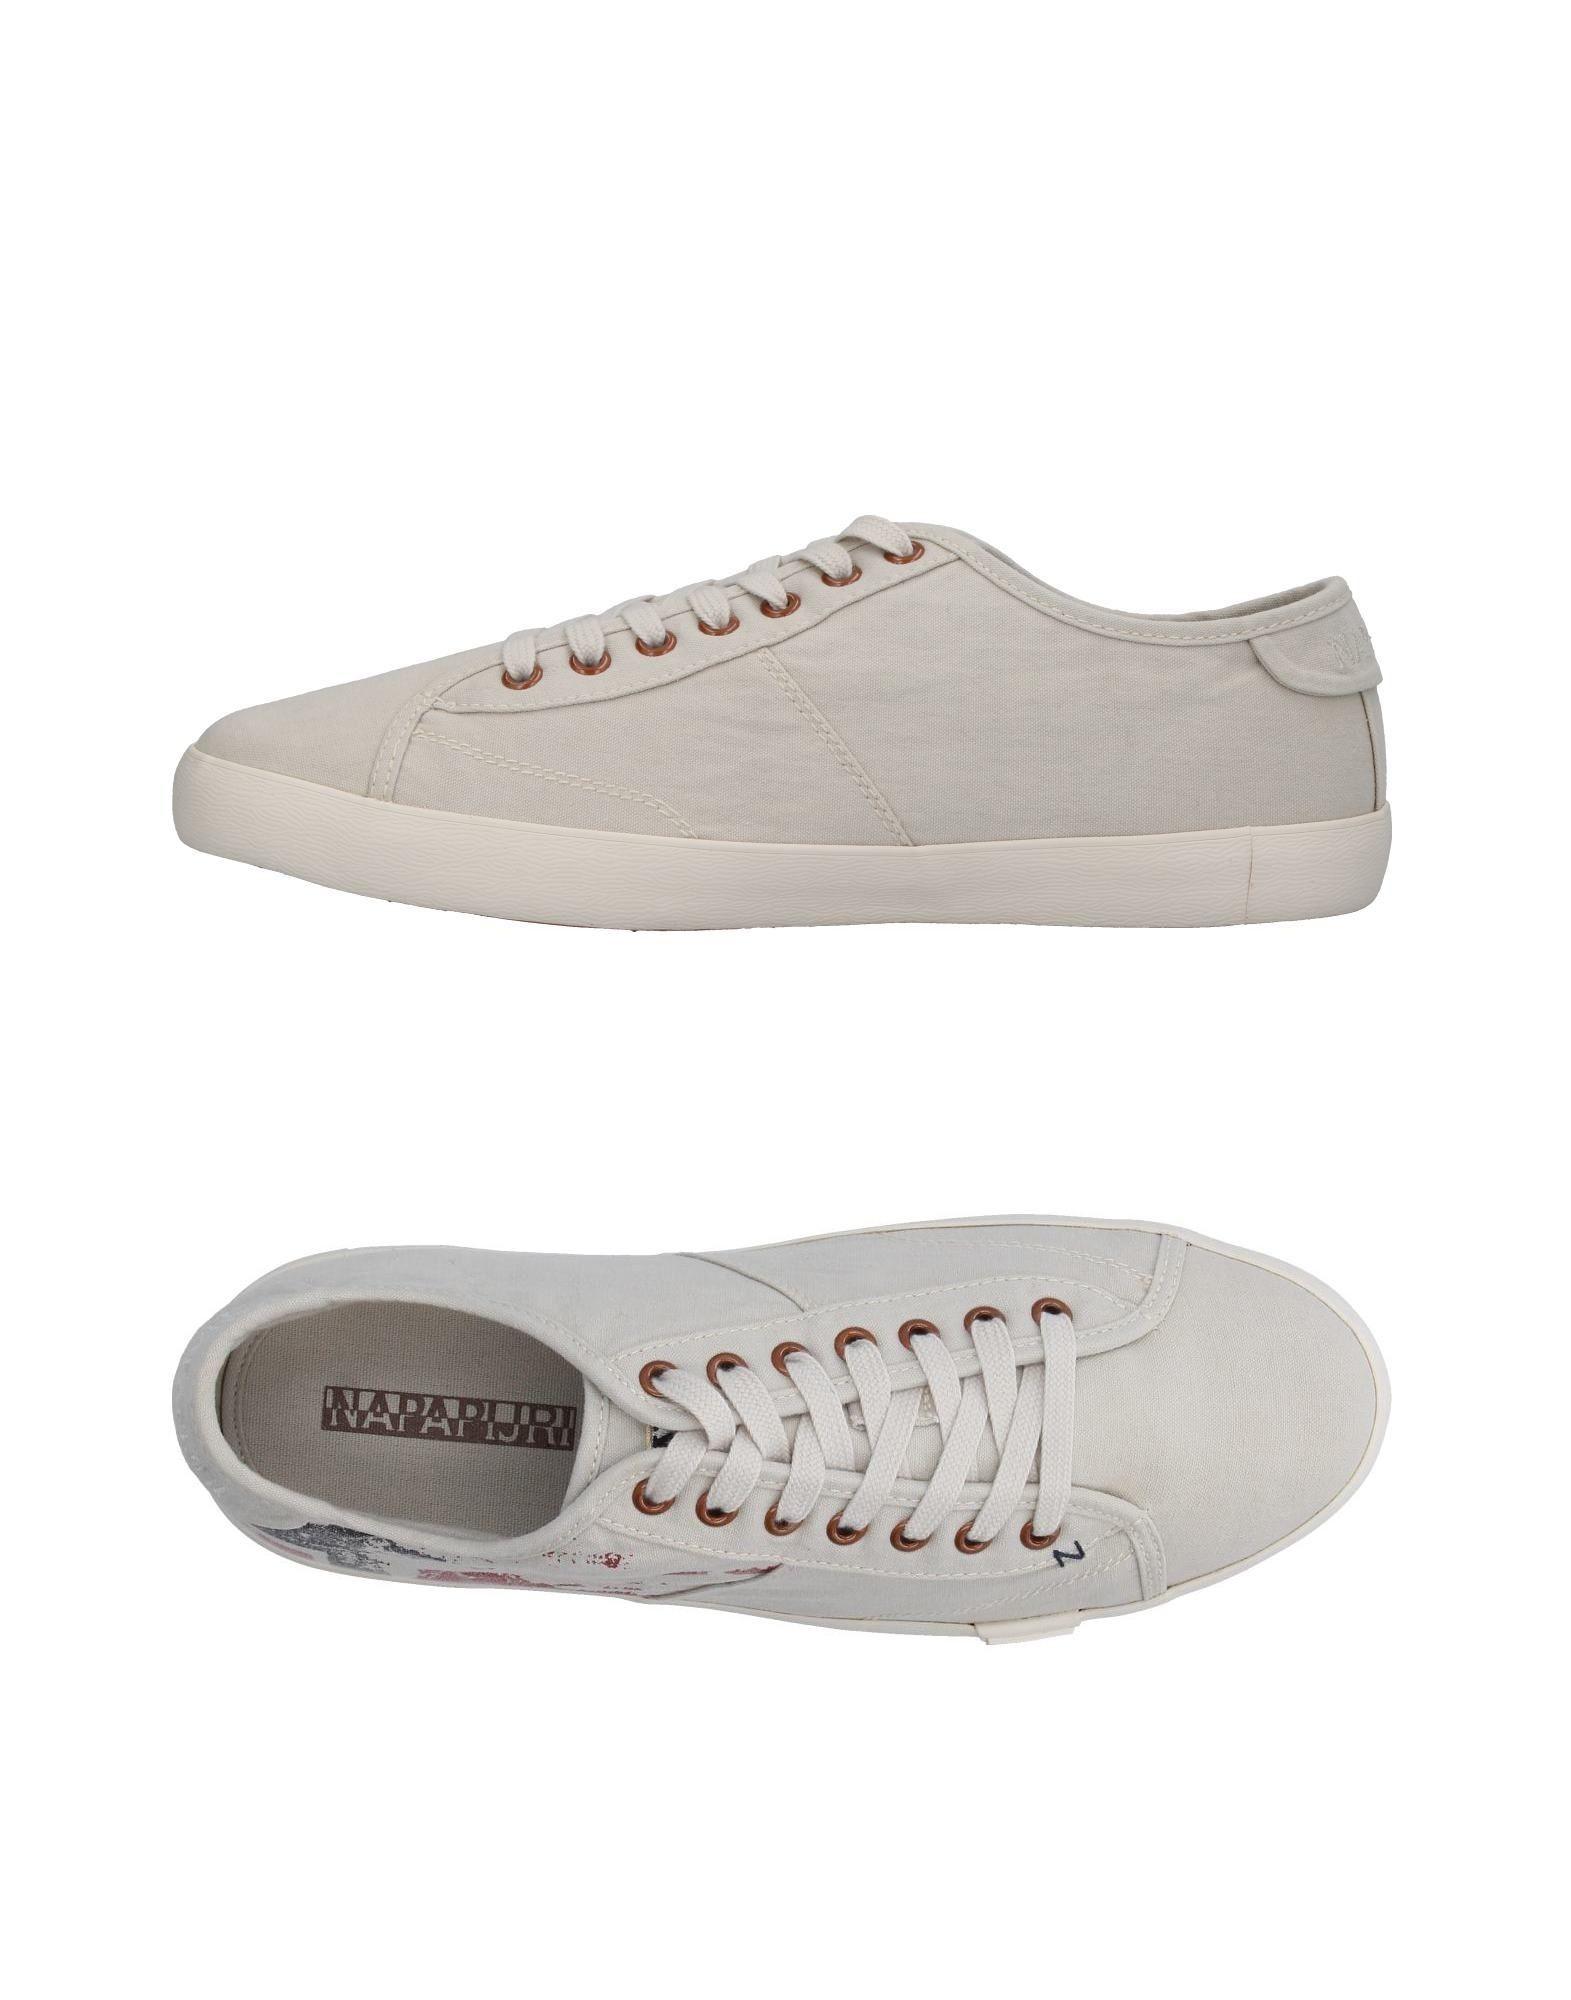 brooks низкие кеды и кроссовки NAPAPIJRI Низкие кеды и кроссовки